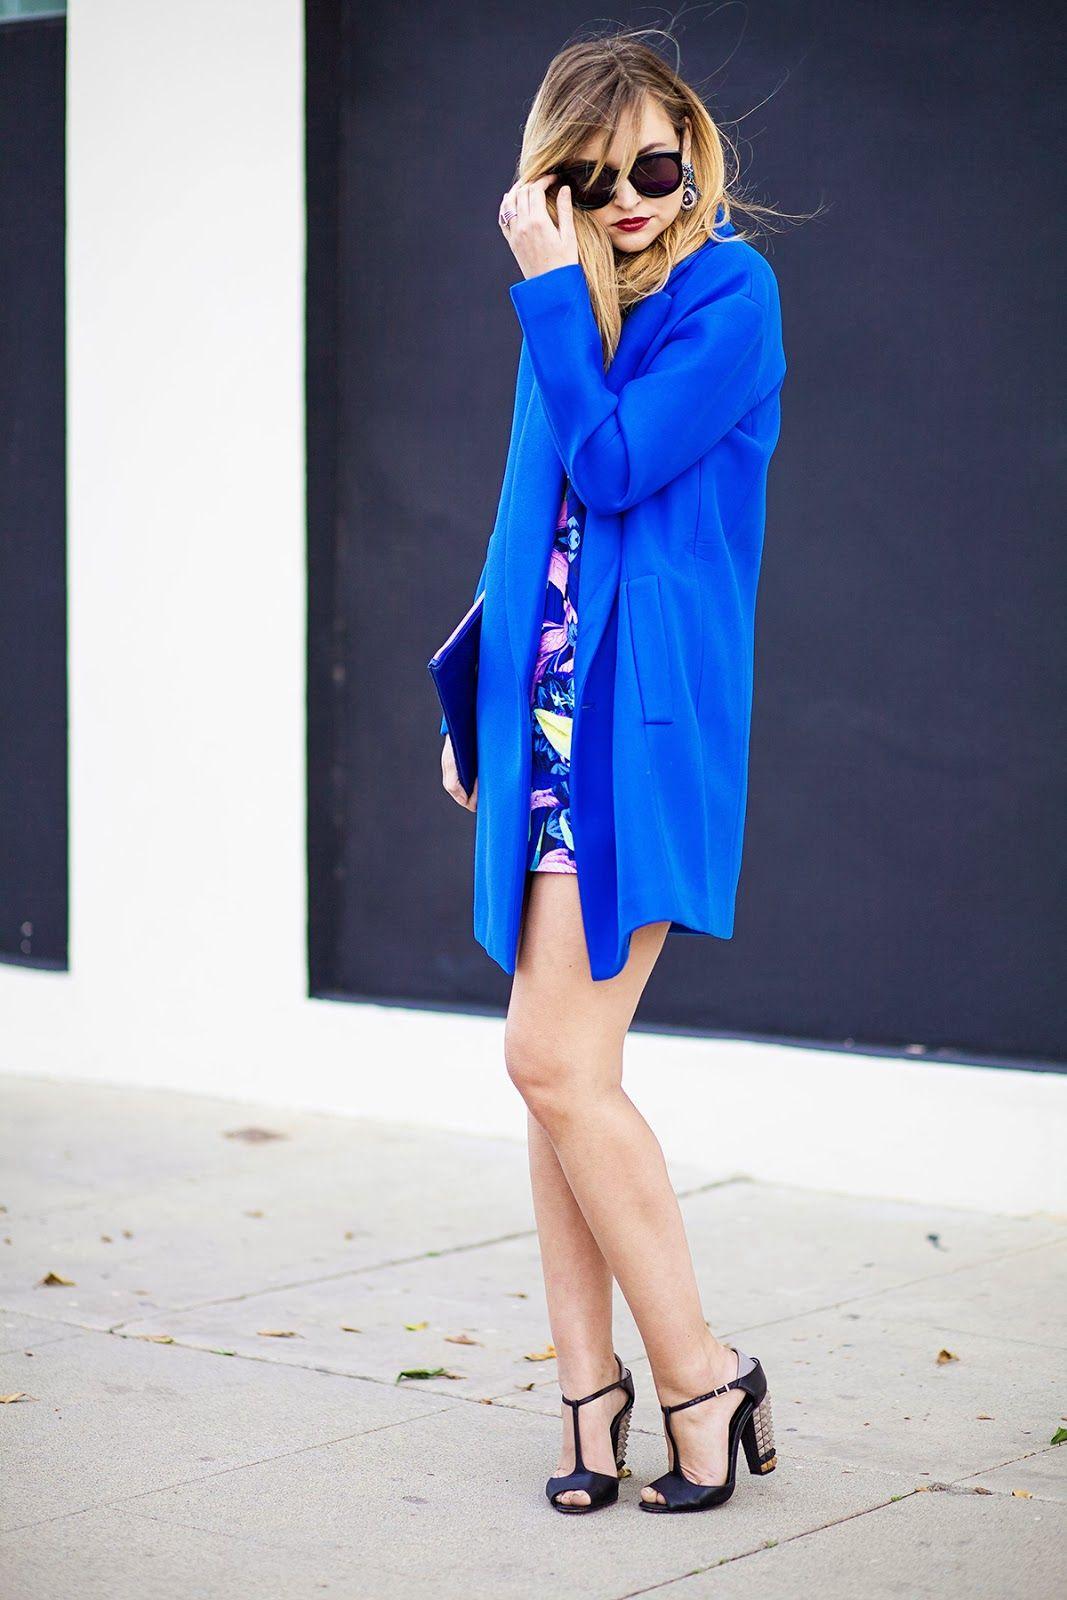 Late Afternoon / bluemarine //  #Fashion, #FashionBlog, #FashionBlogger, #Ootd, #OutfitOfTheDay, #Style